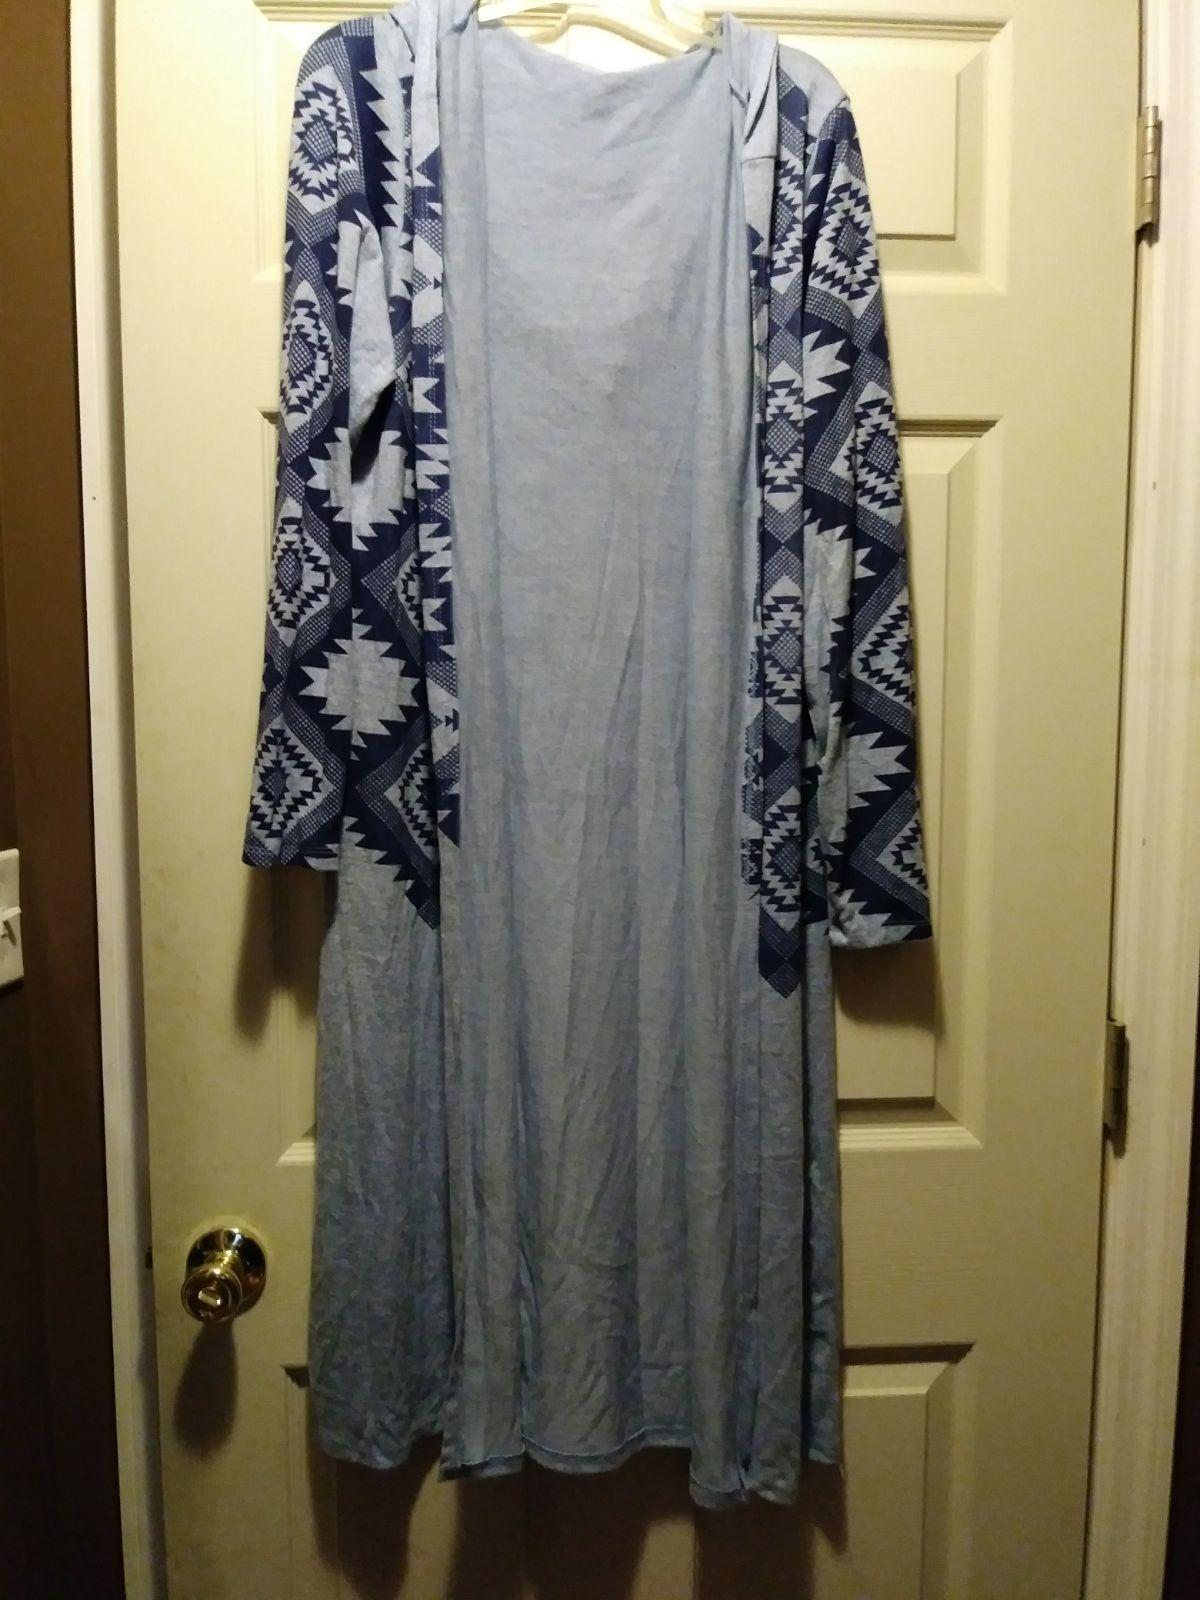 Ladies 1x long duster cardigan Aztec - Mercari: BUY & SELL THINGS ...